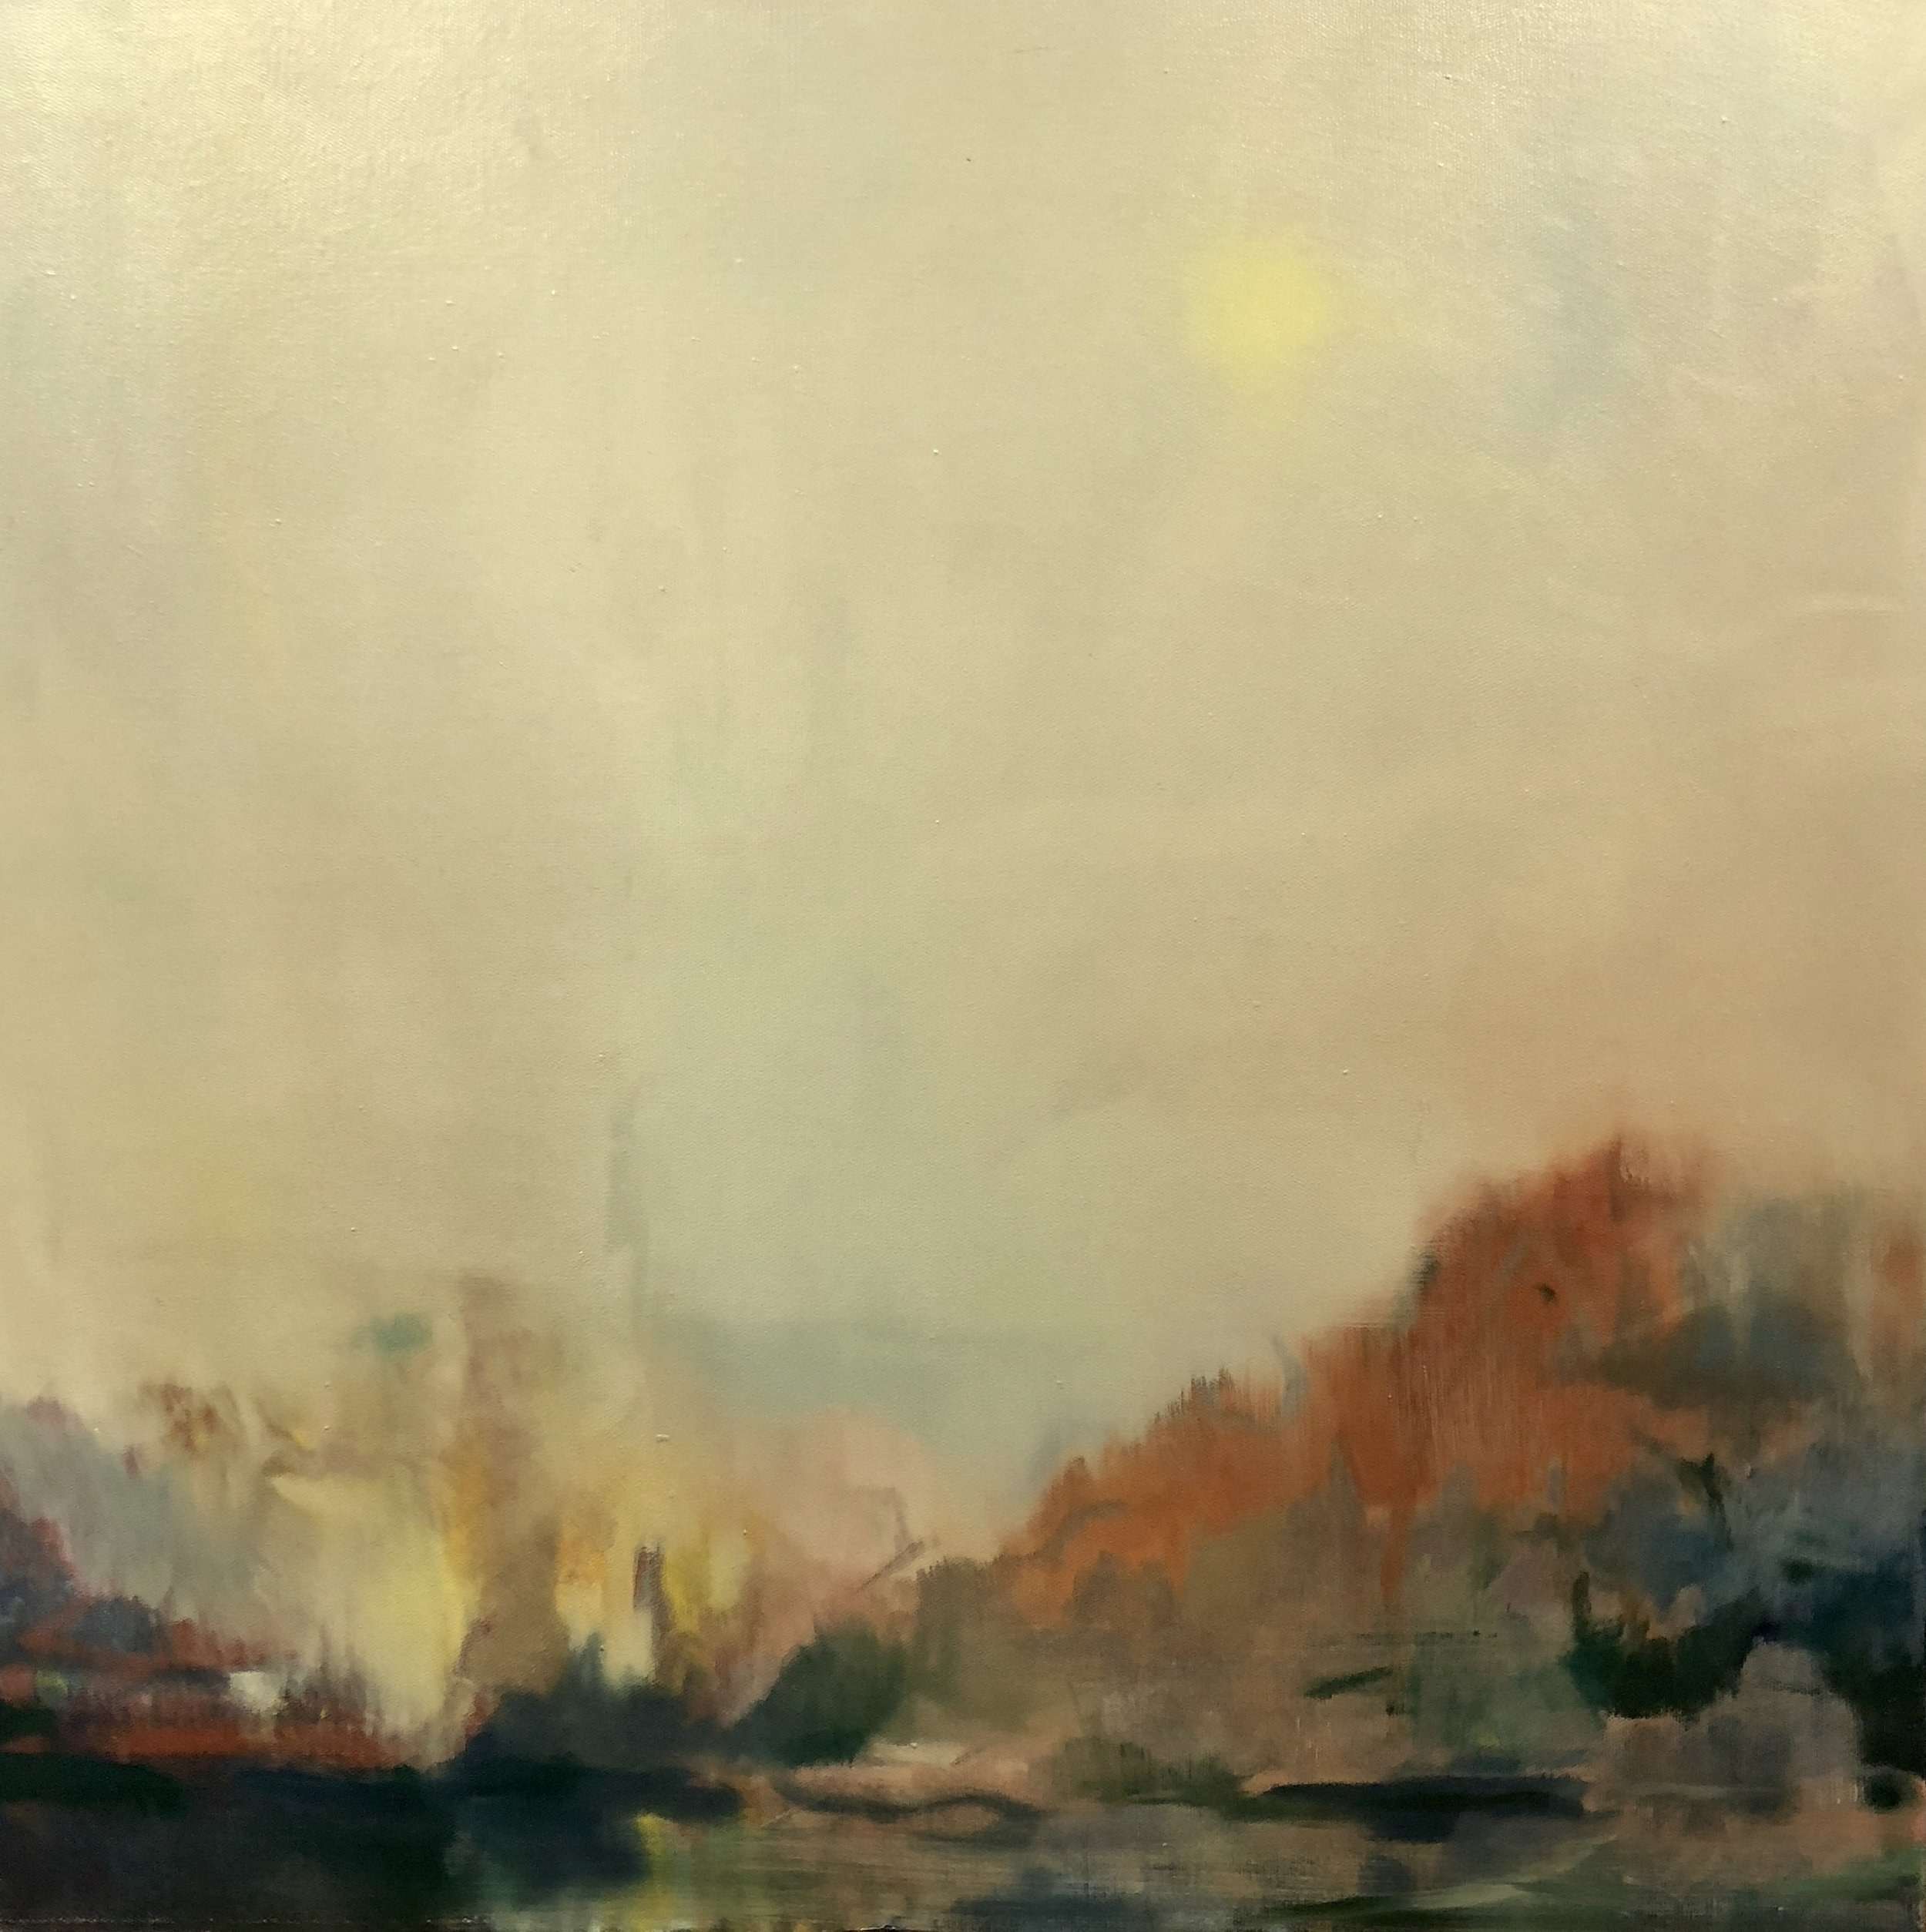 Dan Nelson   Dust and light  2018  oil on canvas  76 x76cm  $1300.00